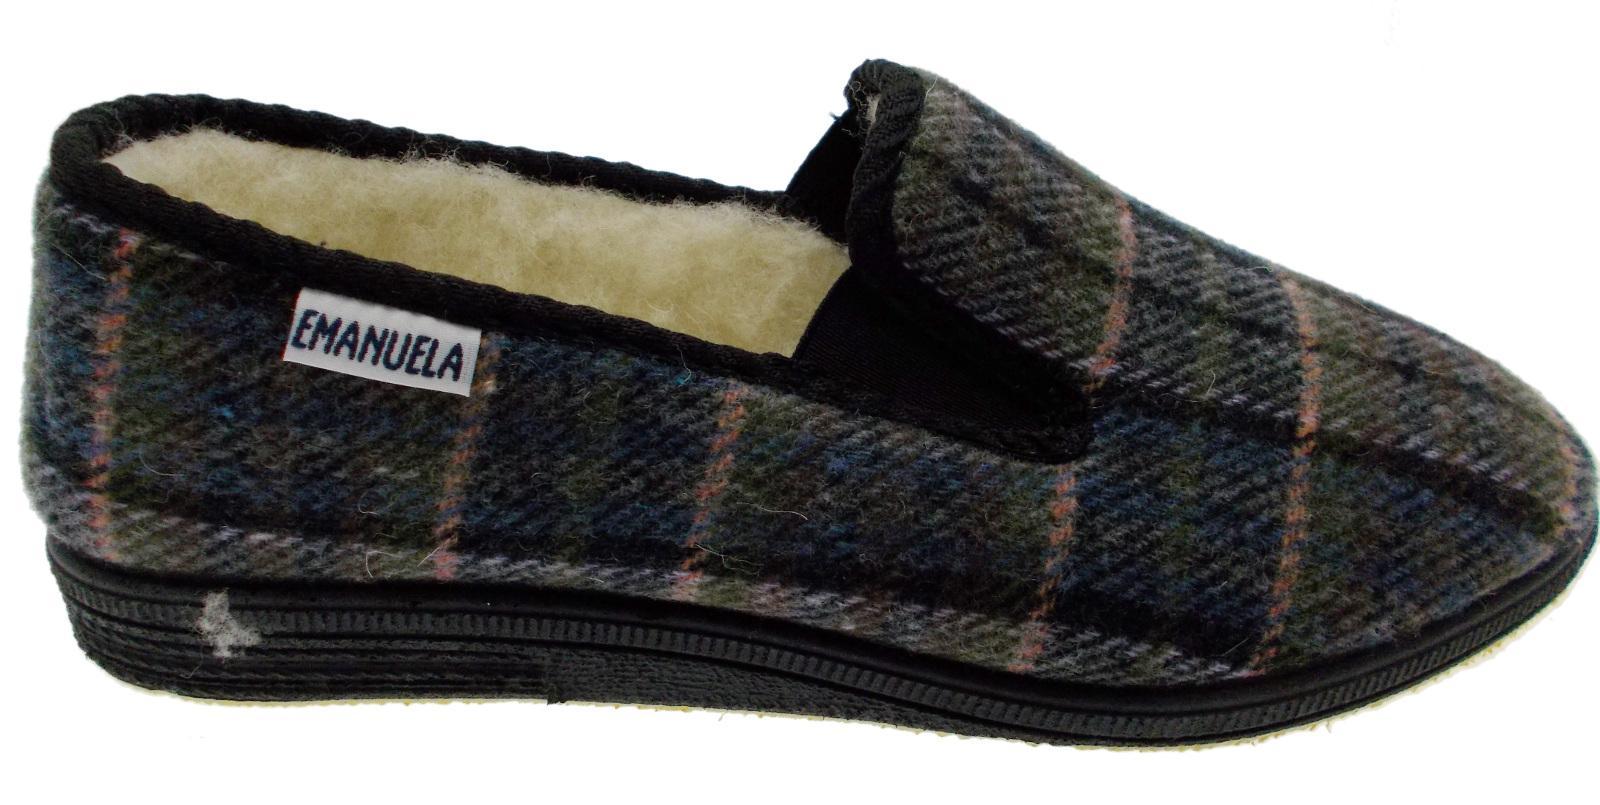 "Hand-made woollen Felt slippers ""SLOOPERS"" size 43 - UK 9"